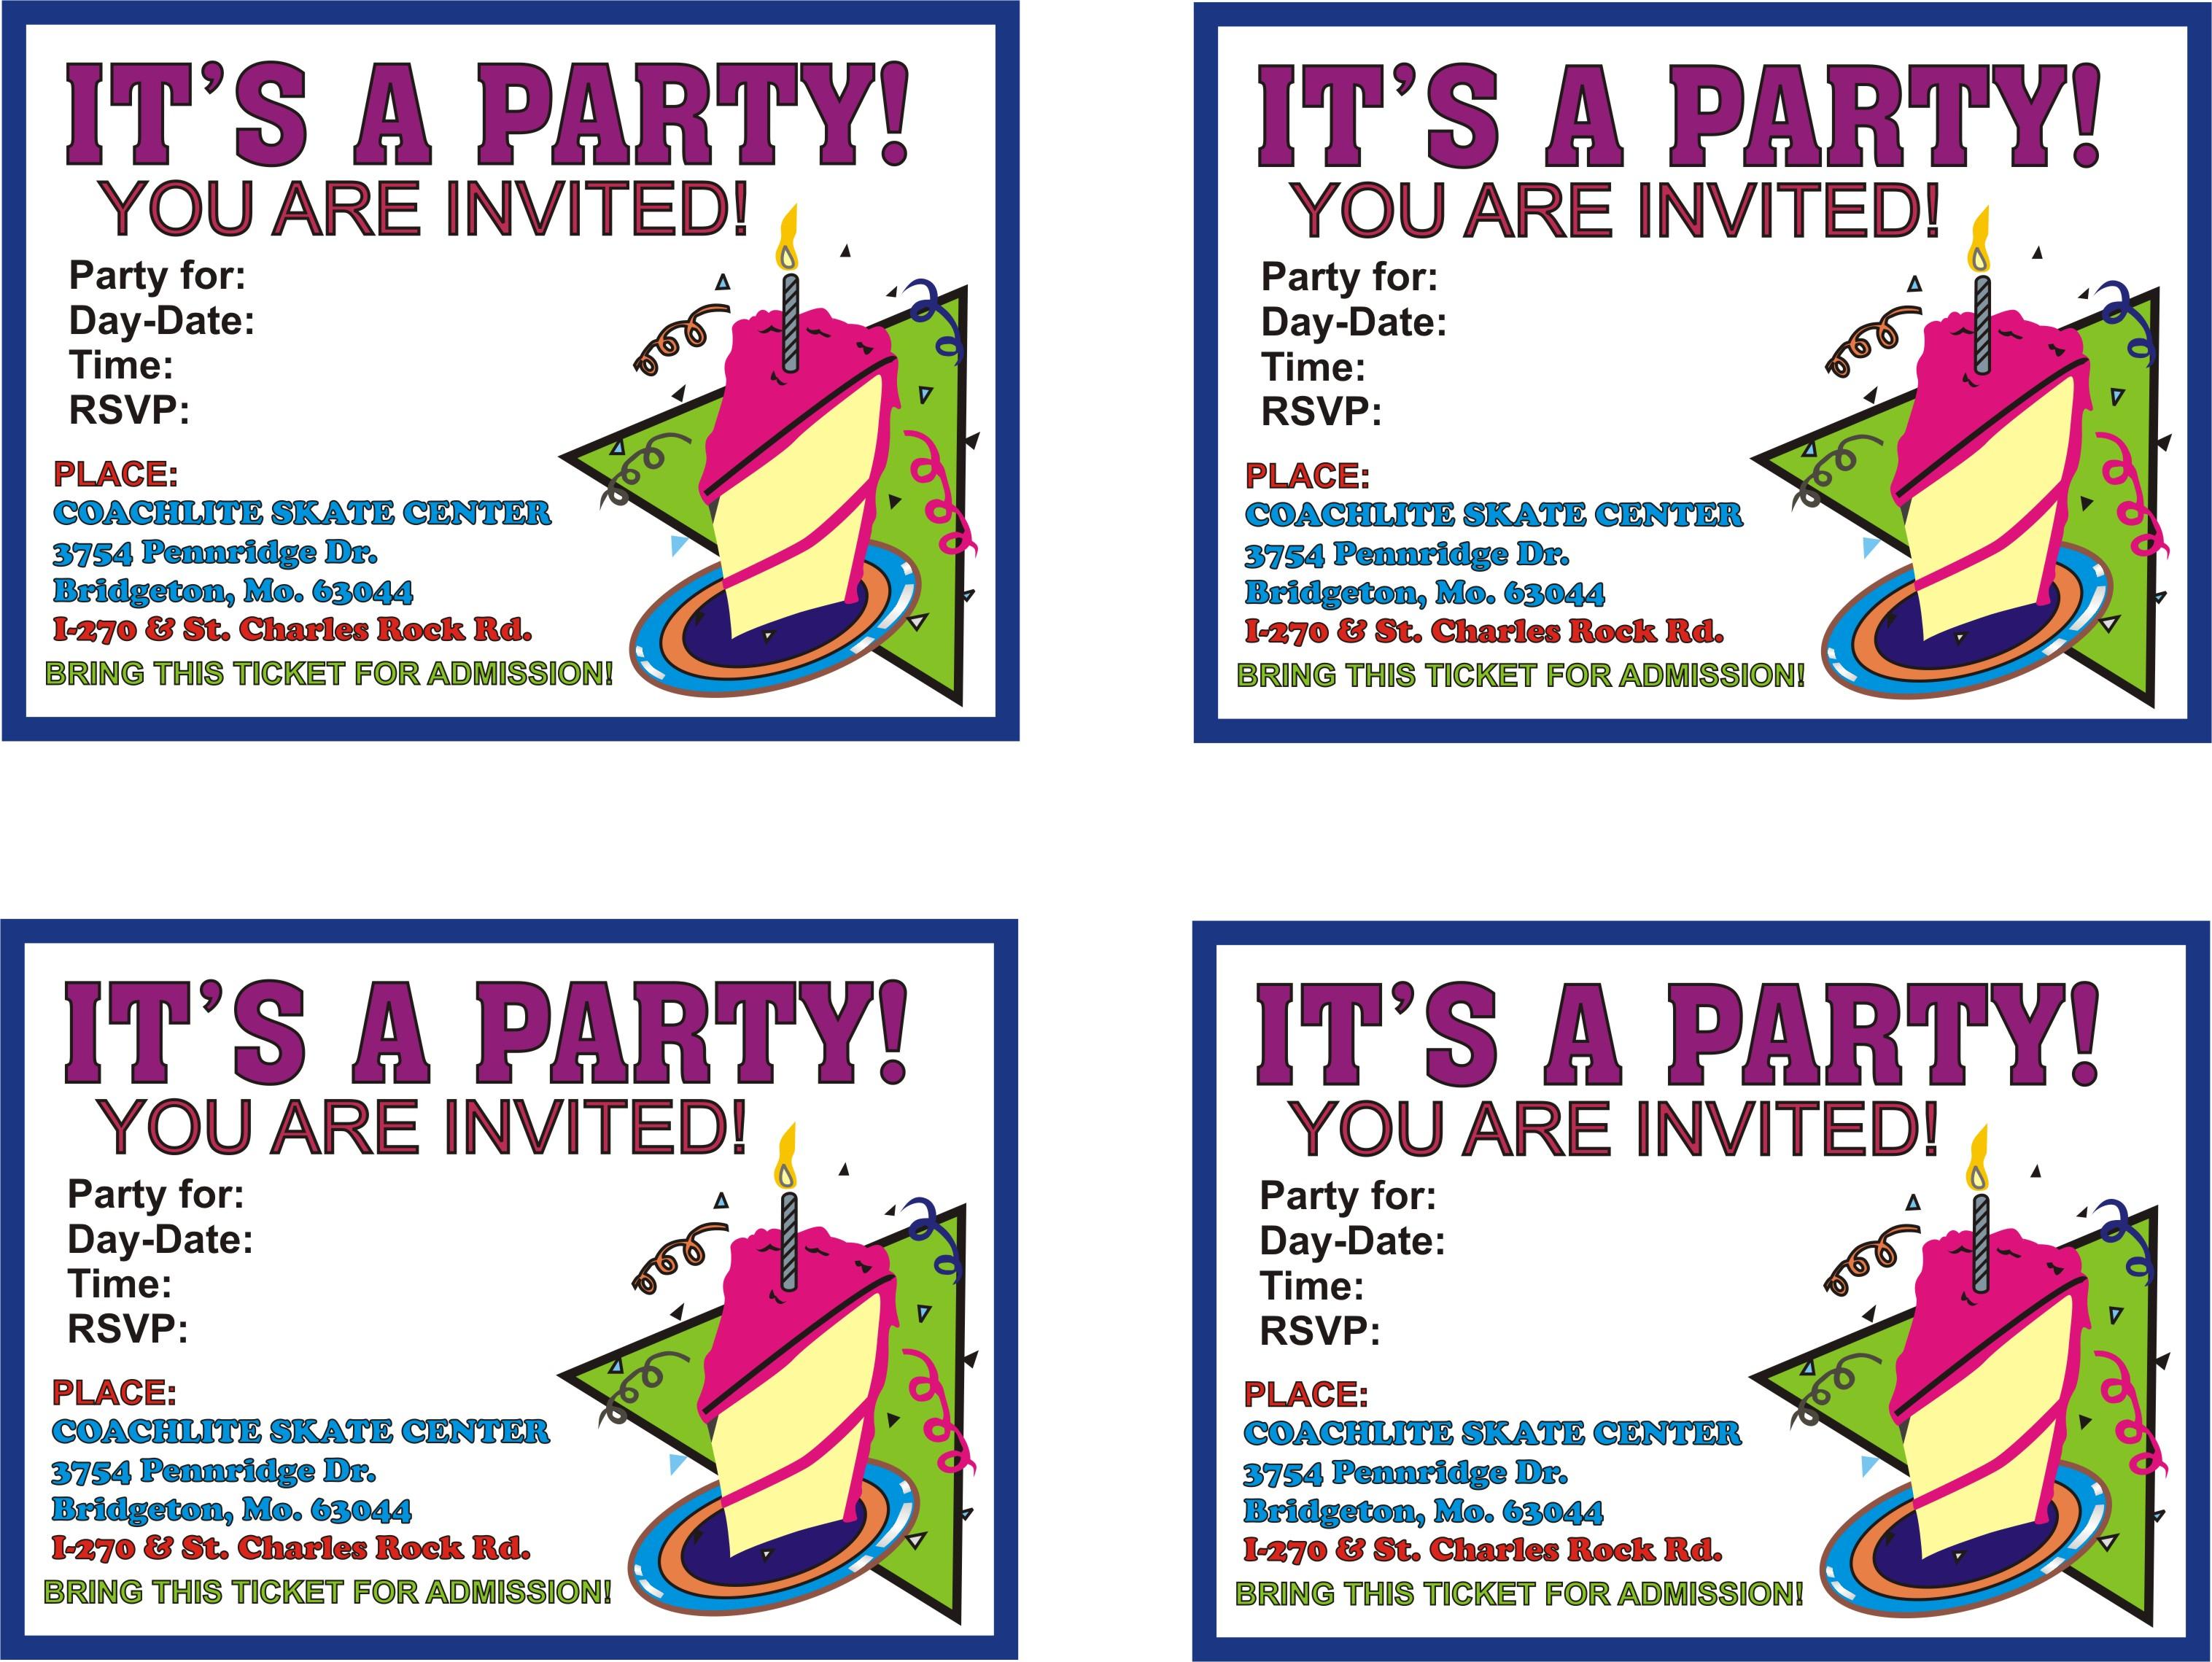 Custom Printable Birthday Cards - Hashtag Bg - Customized Birthday Cards Free Printable